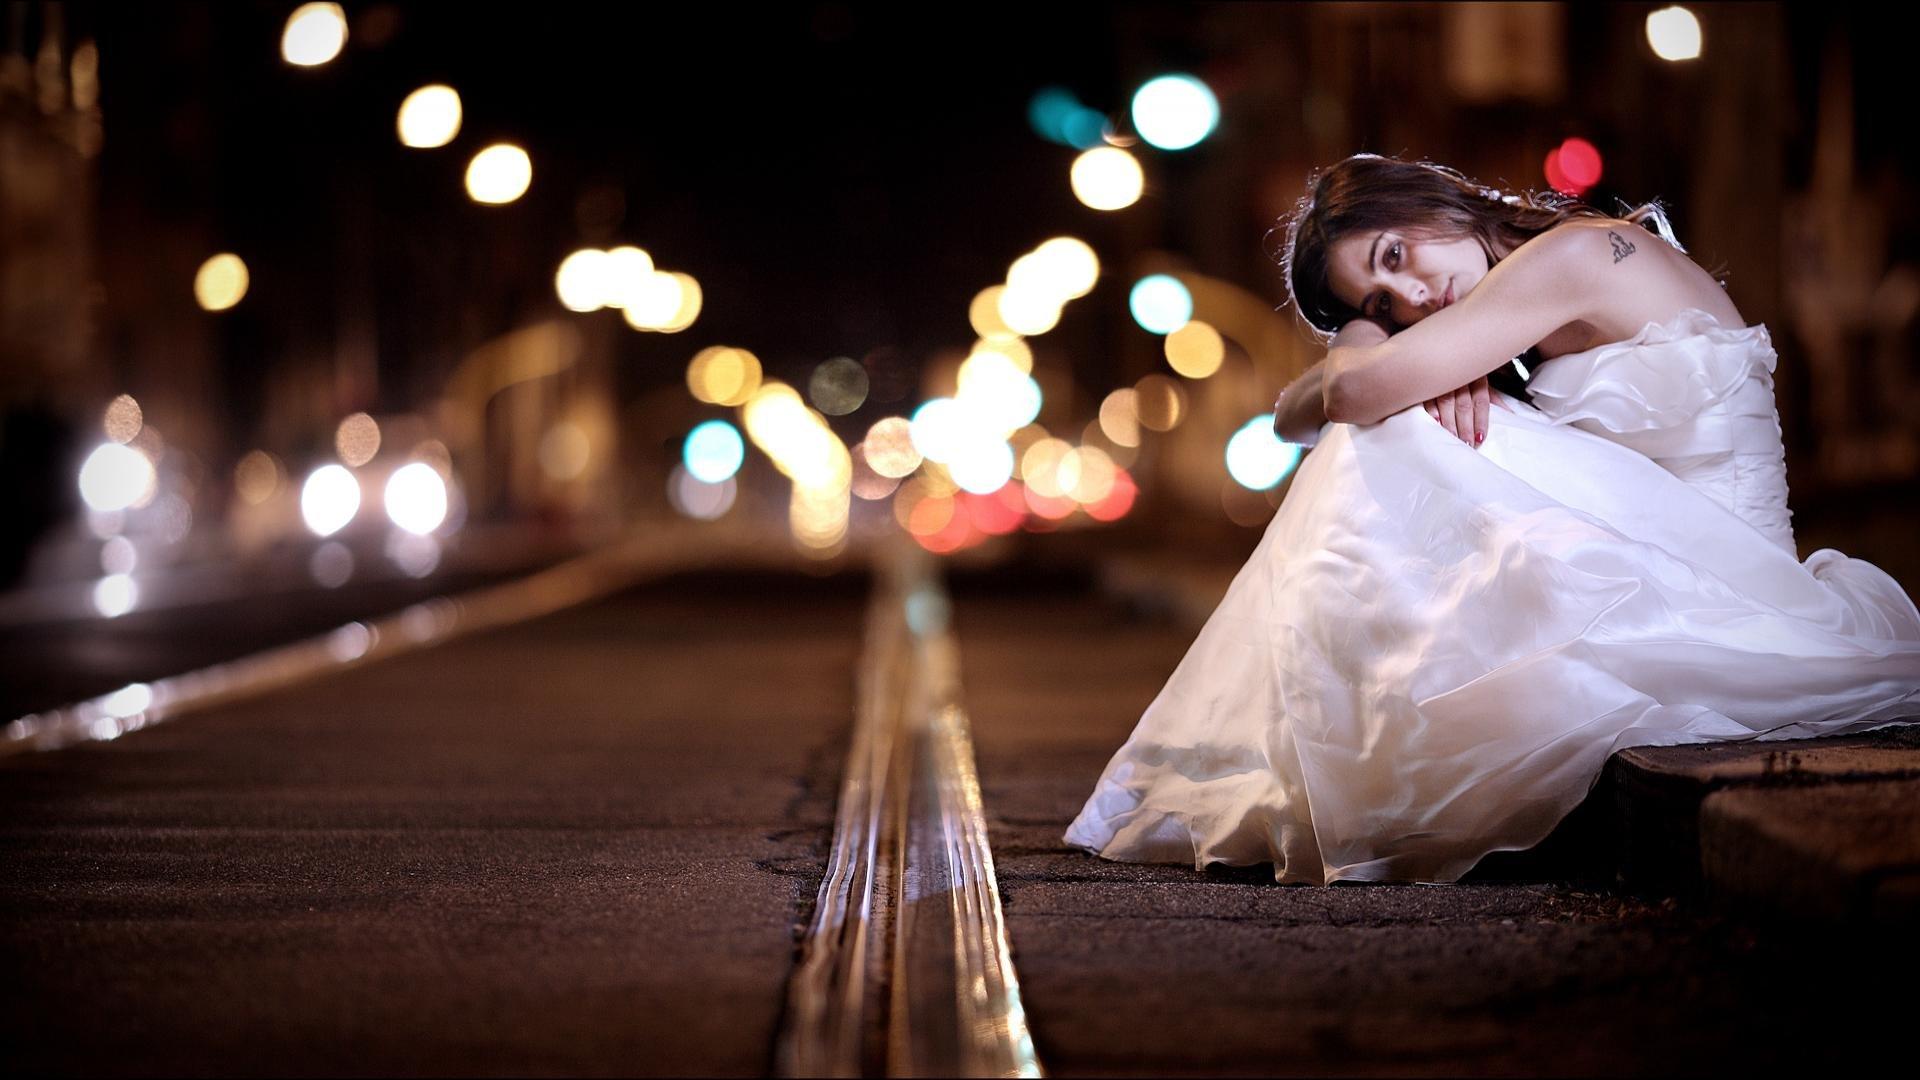 Download Full Hd 1080p Bride In Wedding Dress Desktop Background Id 465849 For Free